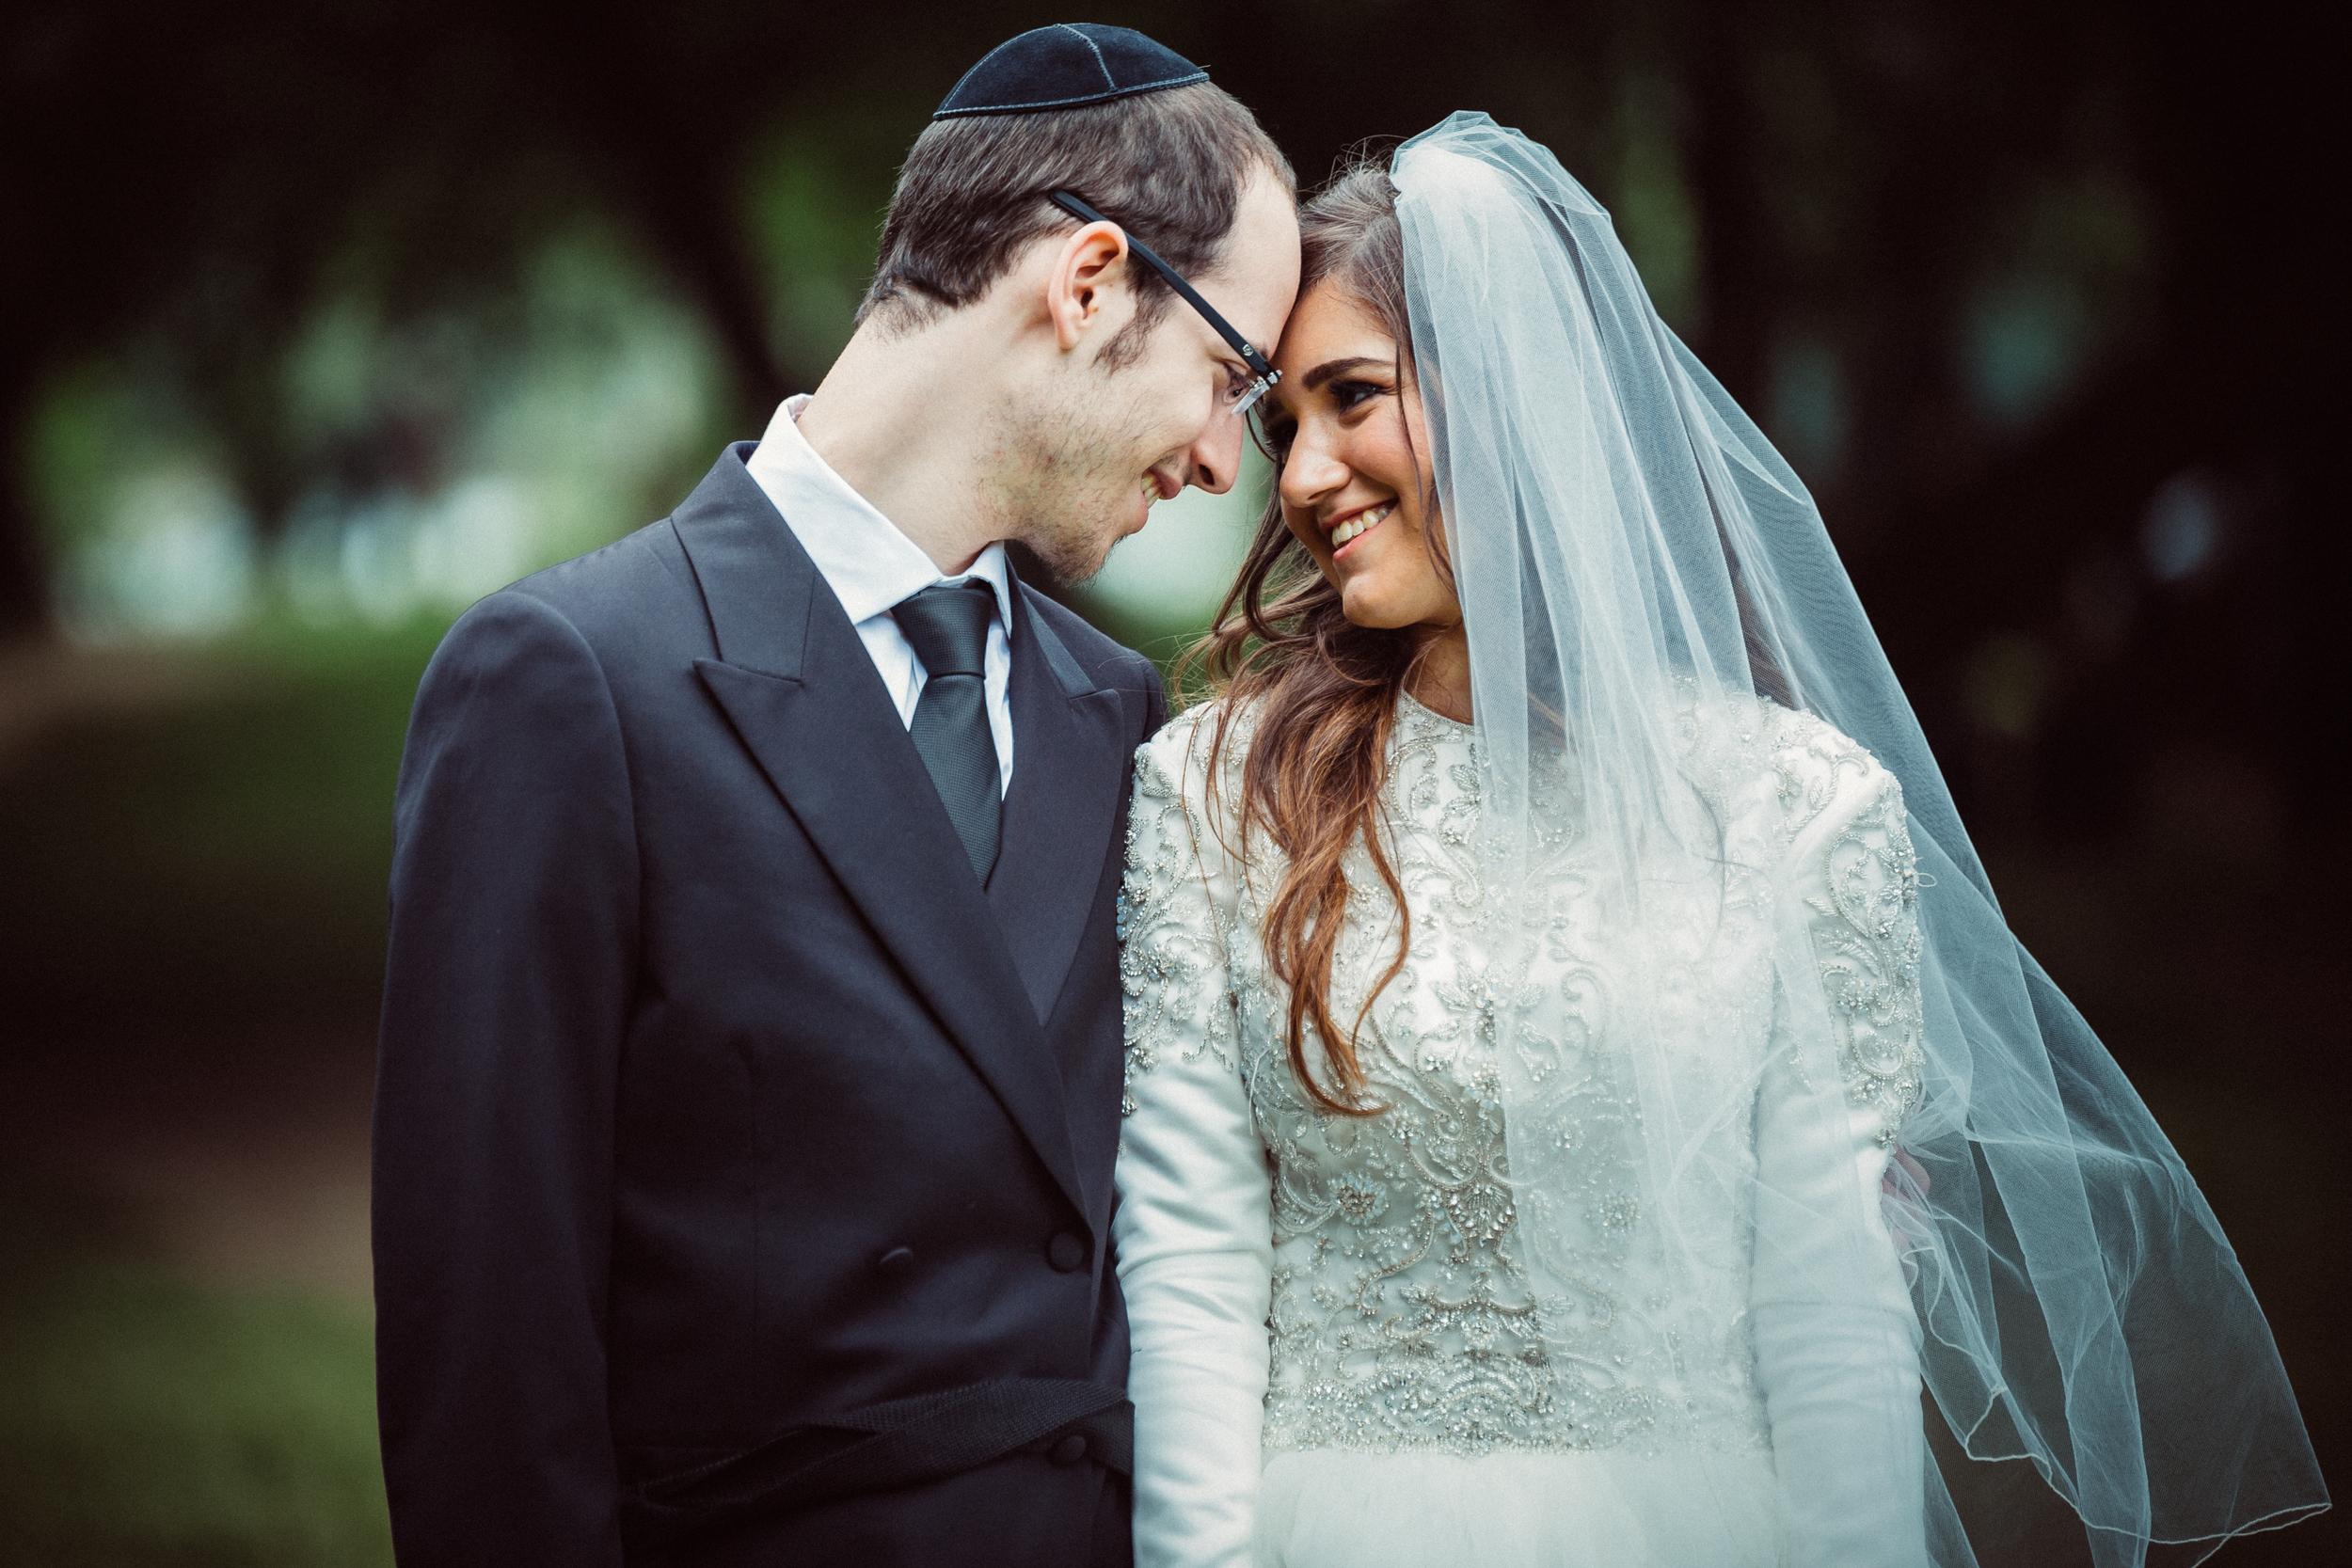 Wedding Iossi and Gitty Khafif  - Eliau Piha studio photography, new york, events, people 770 brooklyn -0641.jpg